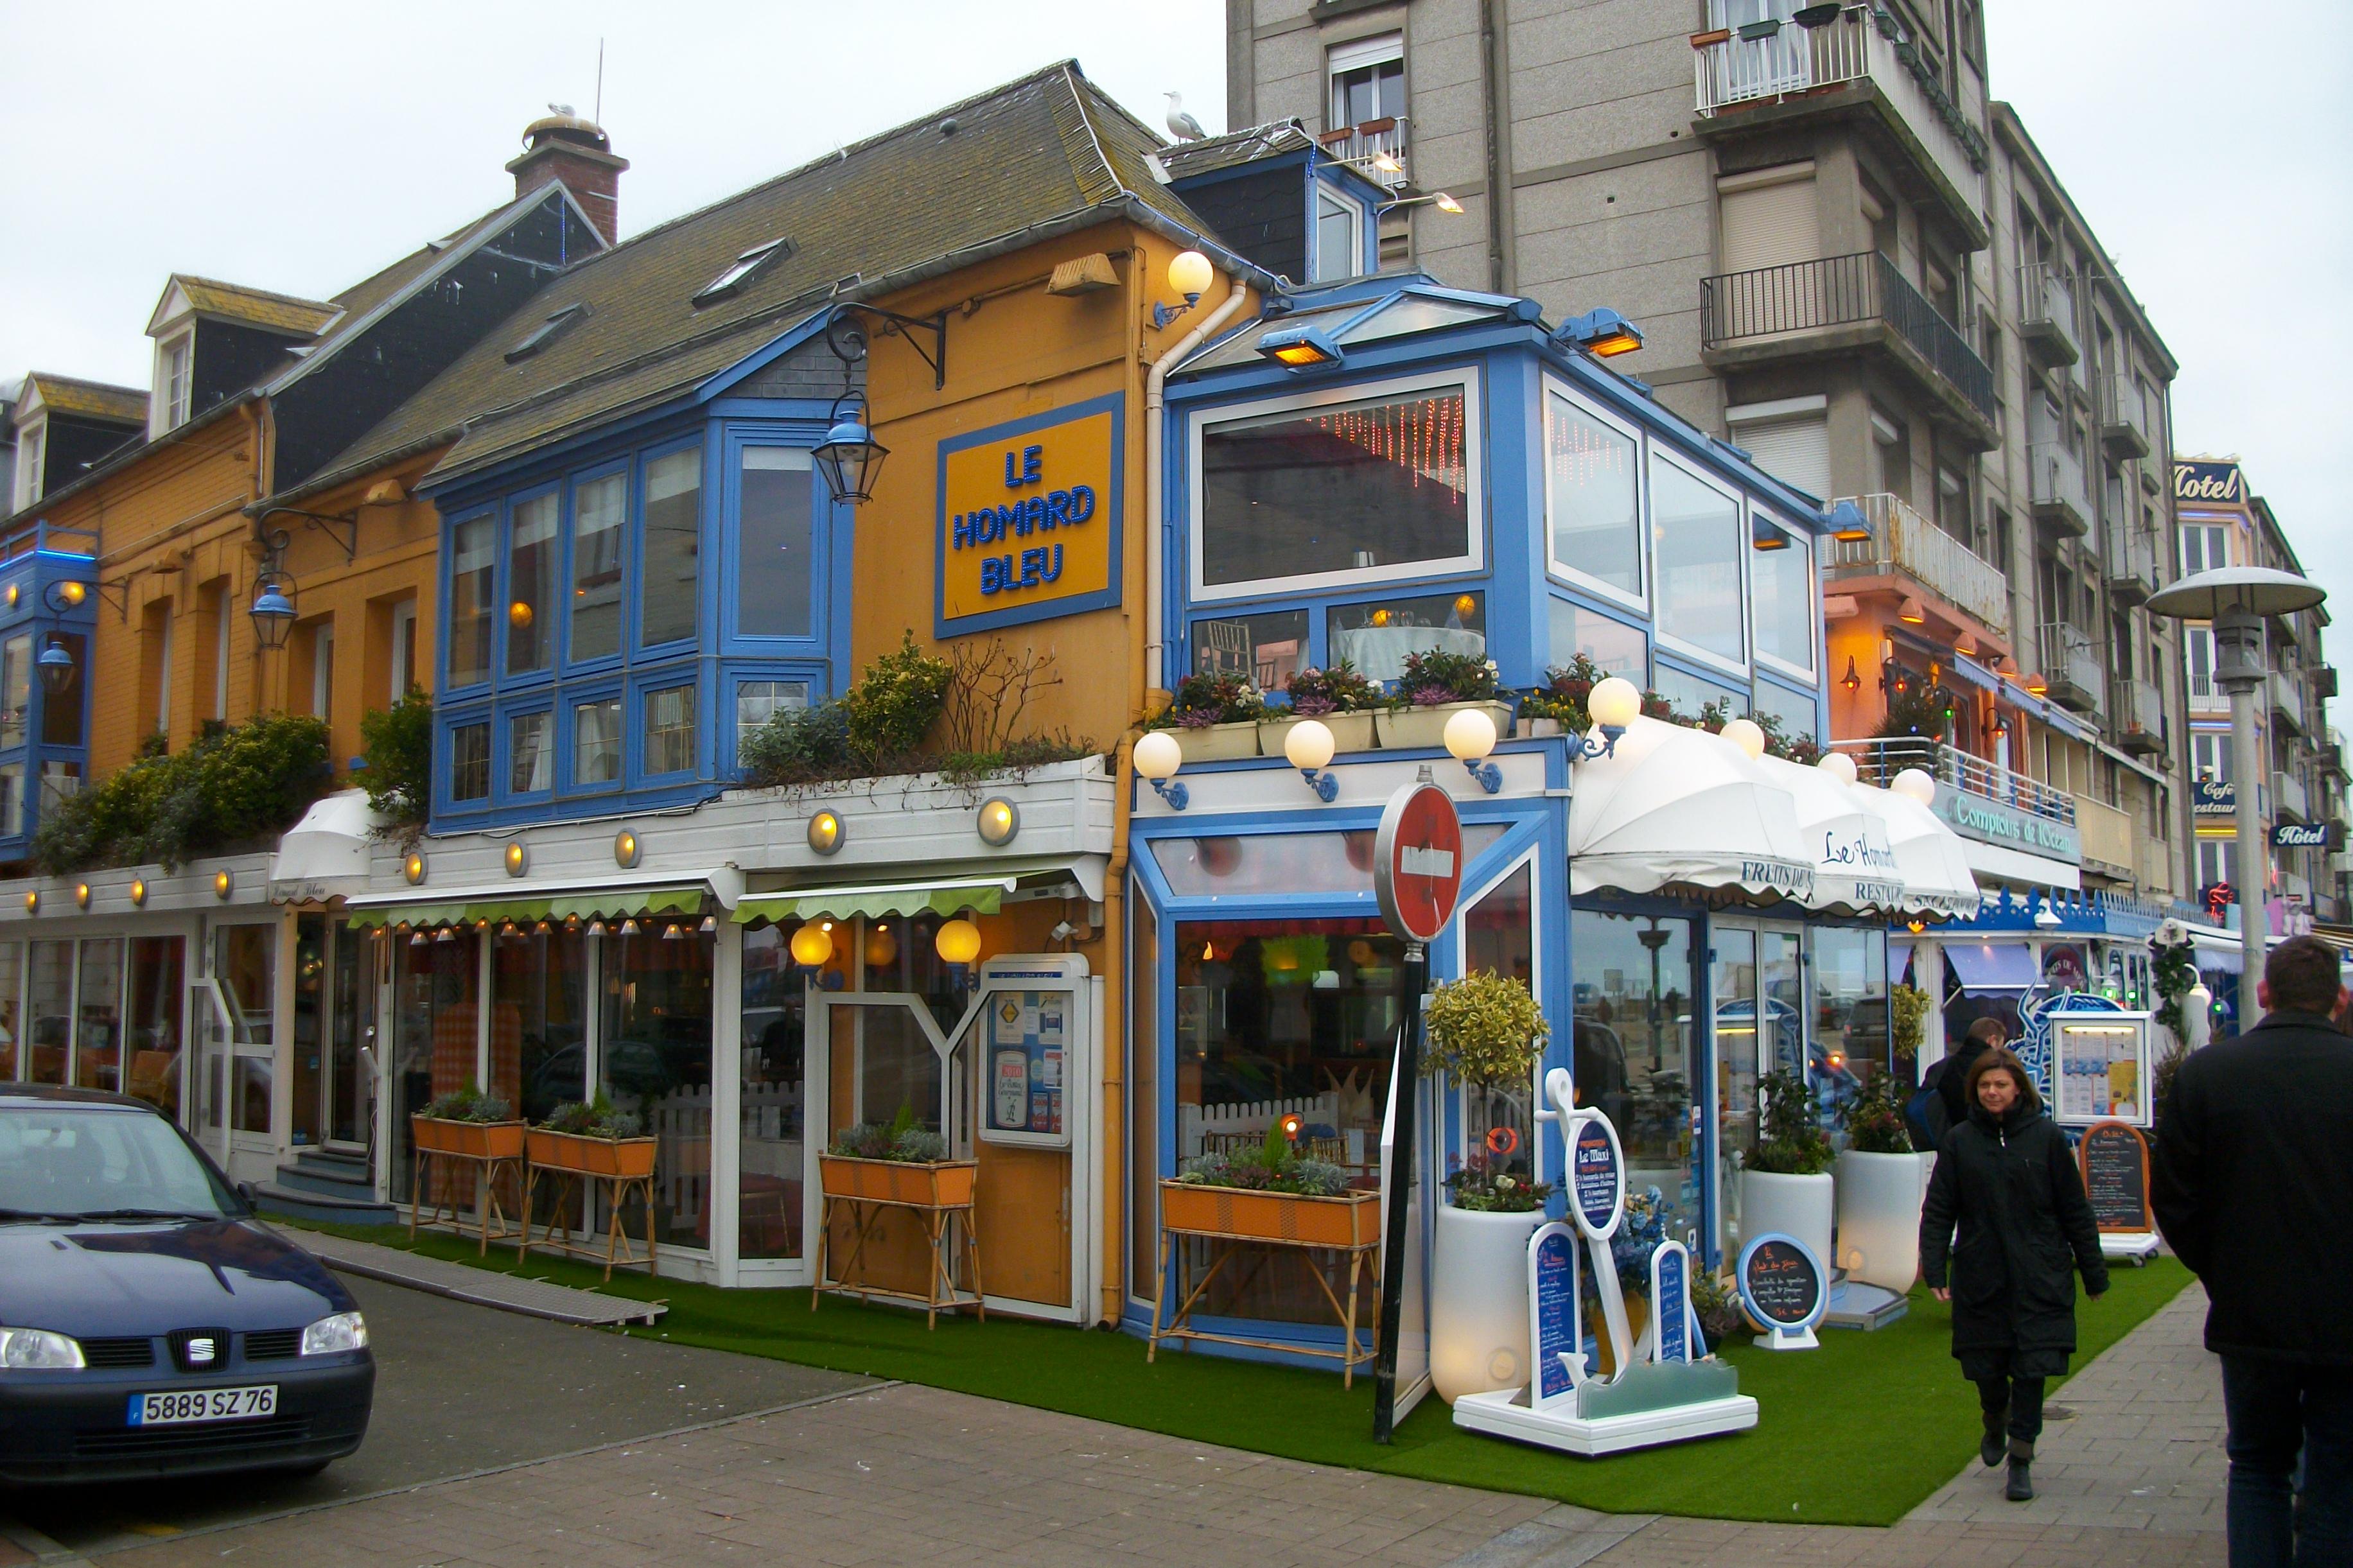 Le homard bleu le tr port restaurant avis num ro de t l phone photos tripadvisor - Fermob luxembourg saldi ...